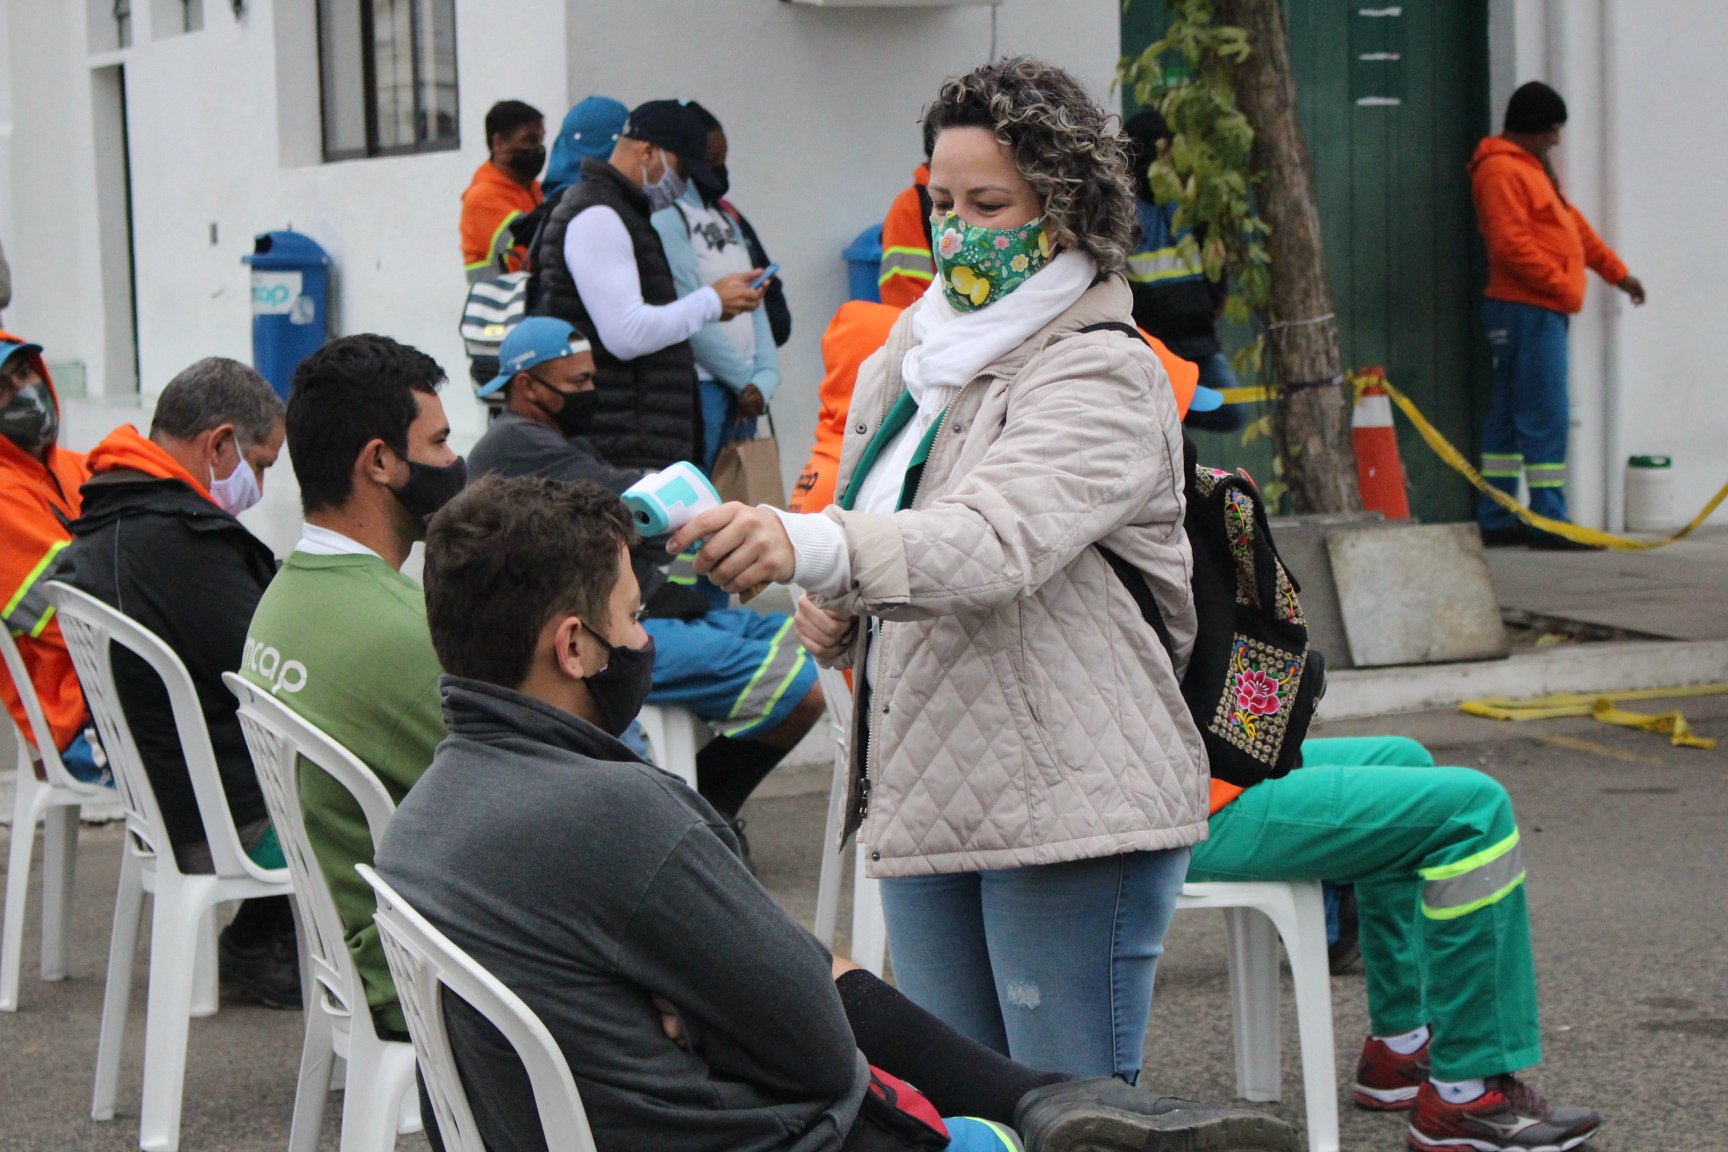 Dirigente do sindicato confere temperatura dos trabalhadores. Foto: Sintrasem